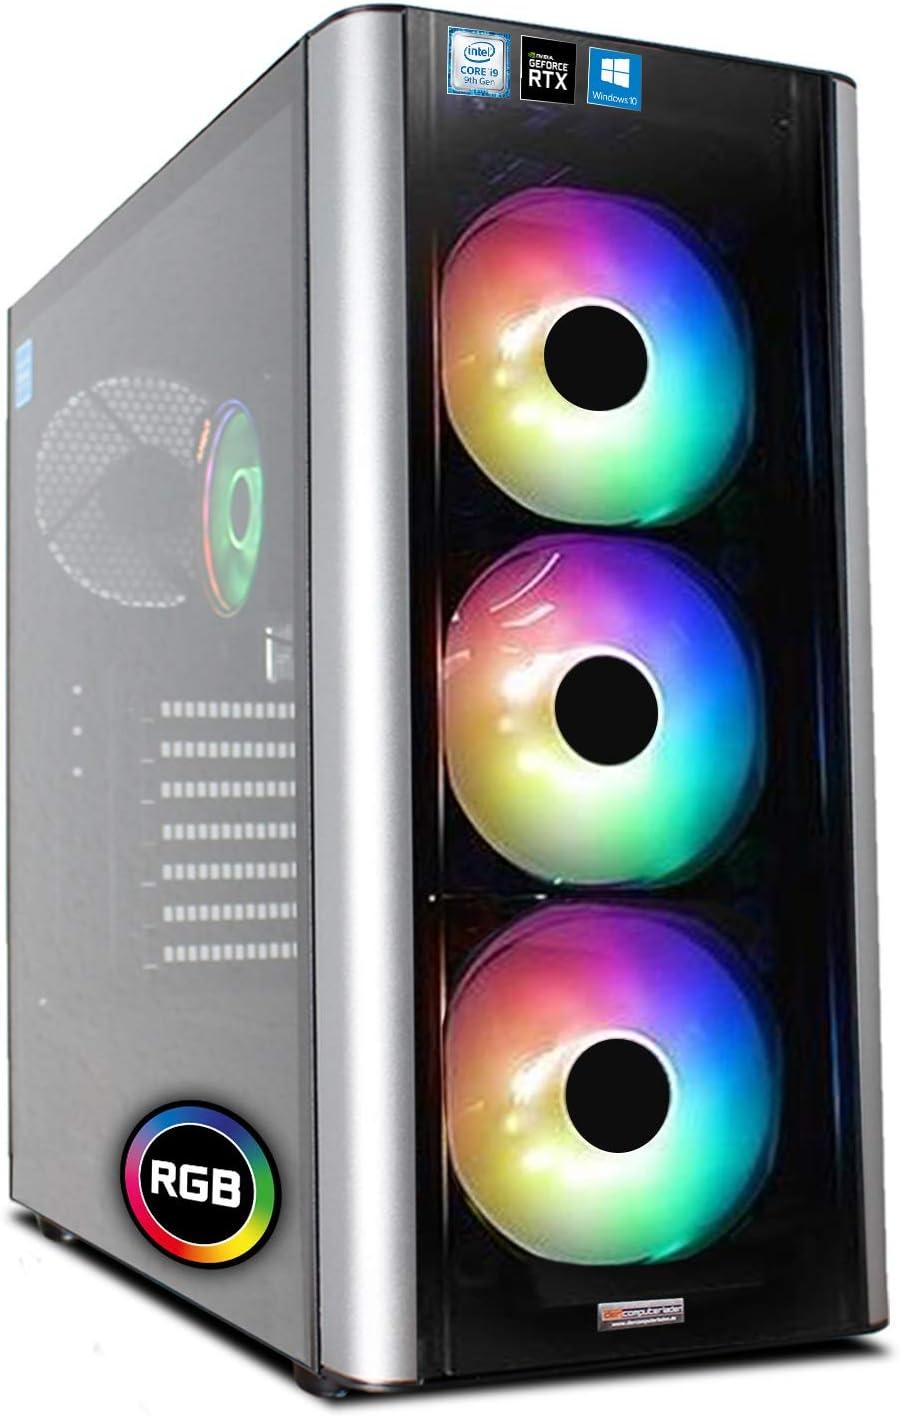 Dcl24 De Gaming Pc Rgb Level 20 Intel I9 9900kf 8x3 6 Computer Zubehör